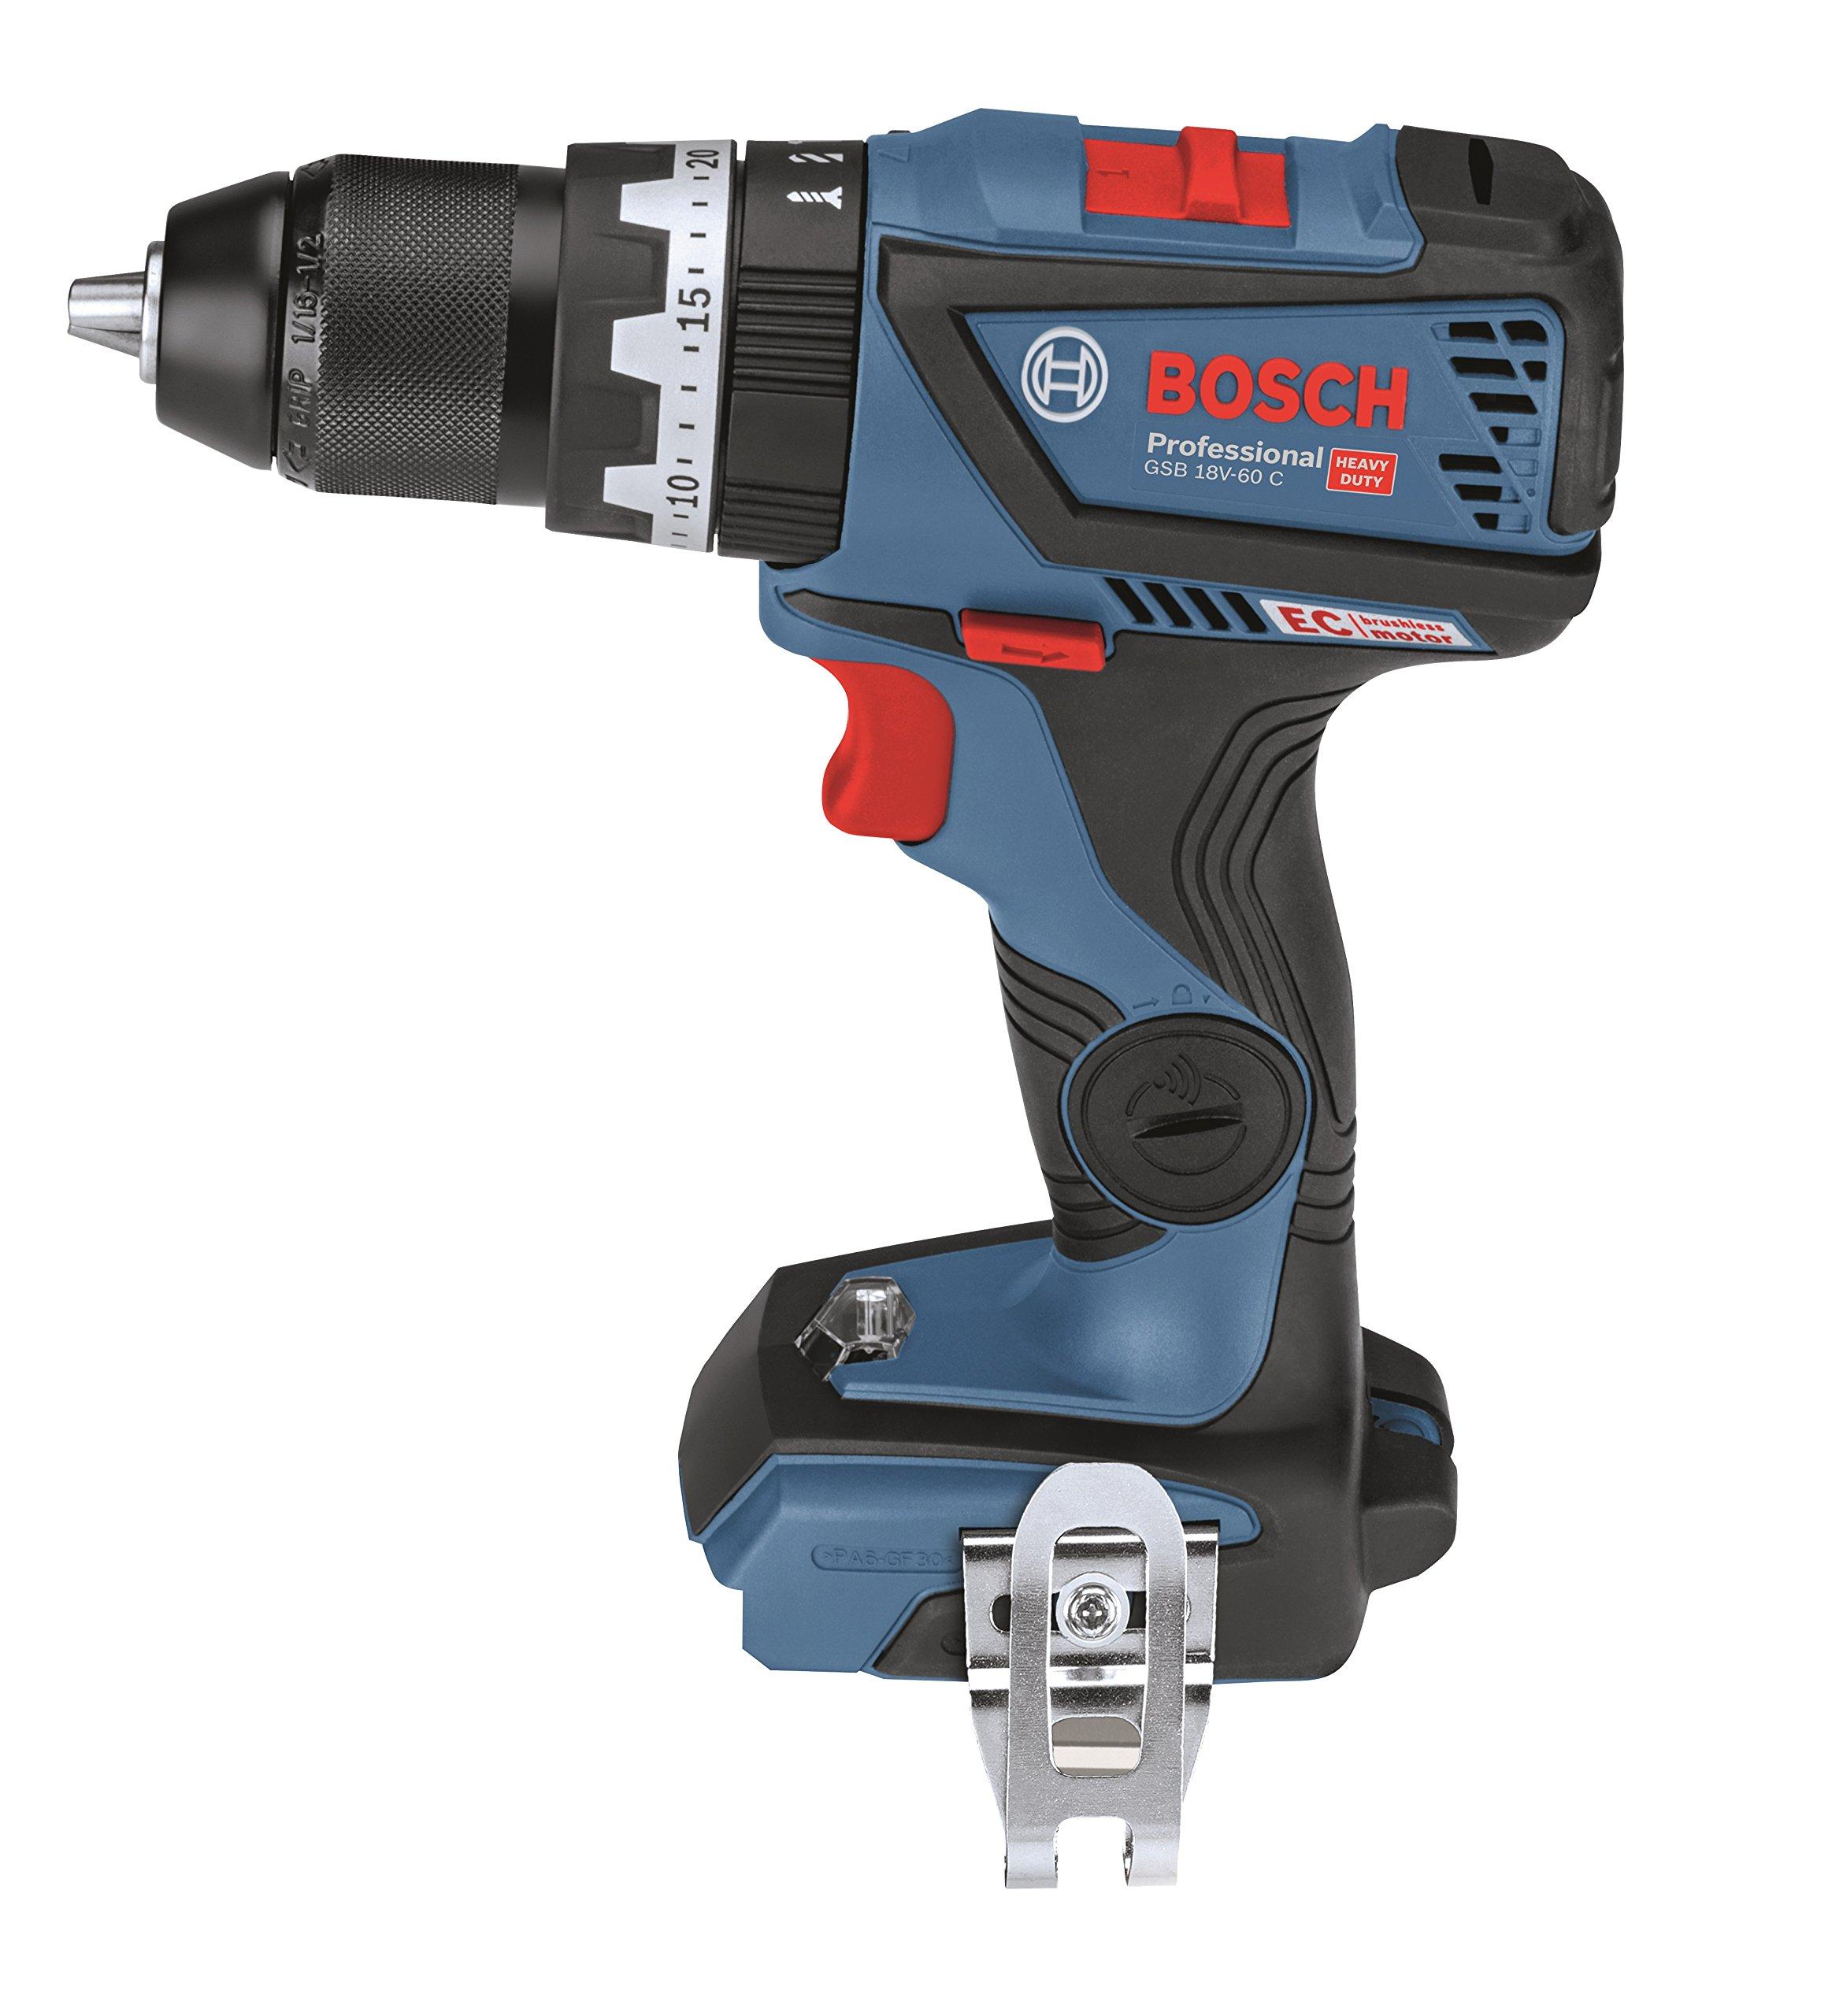 Bosch-Professional-18V-Akku-Schlagbohrschrauber-GSB-18V-60-C-ohne-Akku-L-BOXX-18-Volt-Max-Drehmoment-60-Nm-max-Schrauben–10-mm